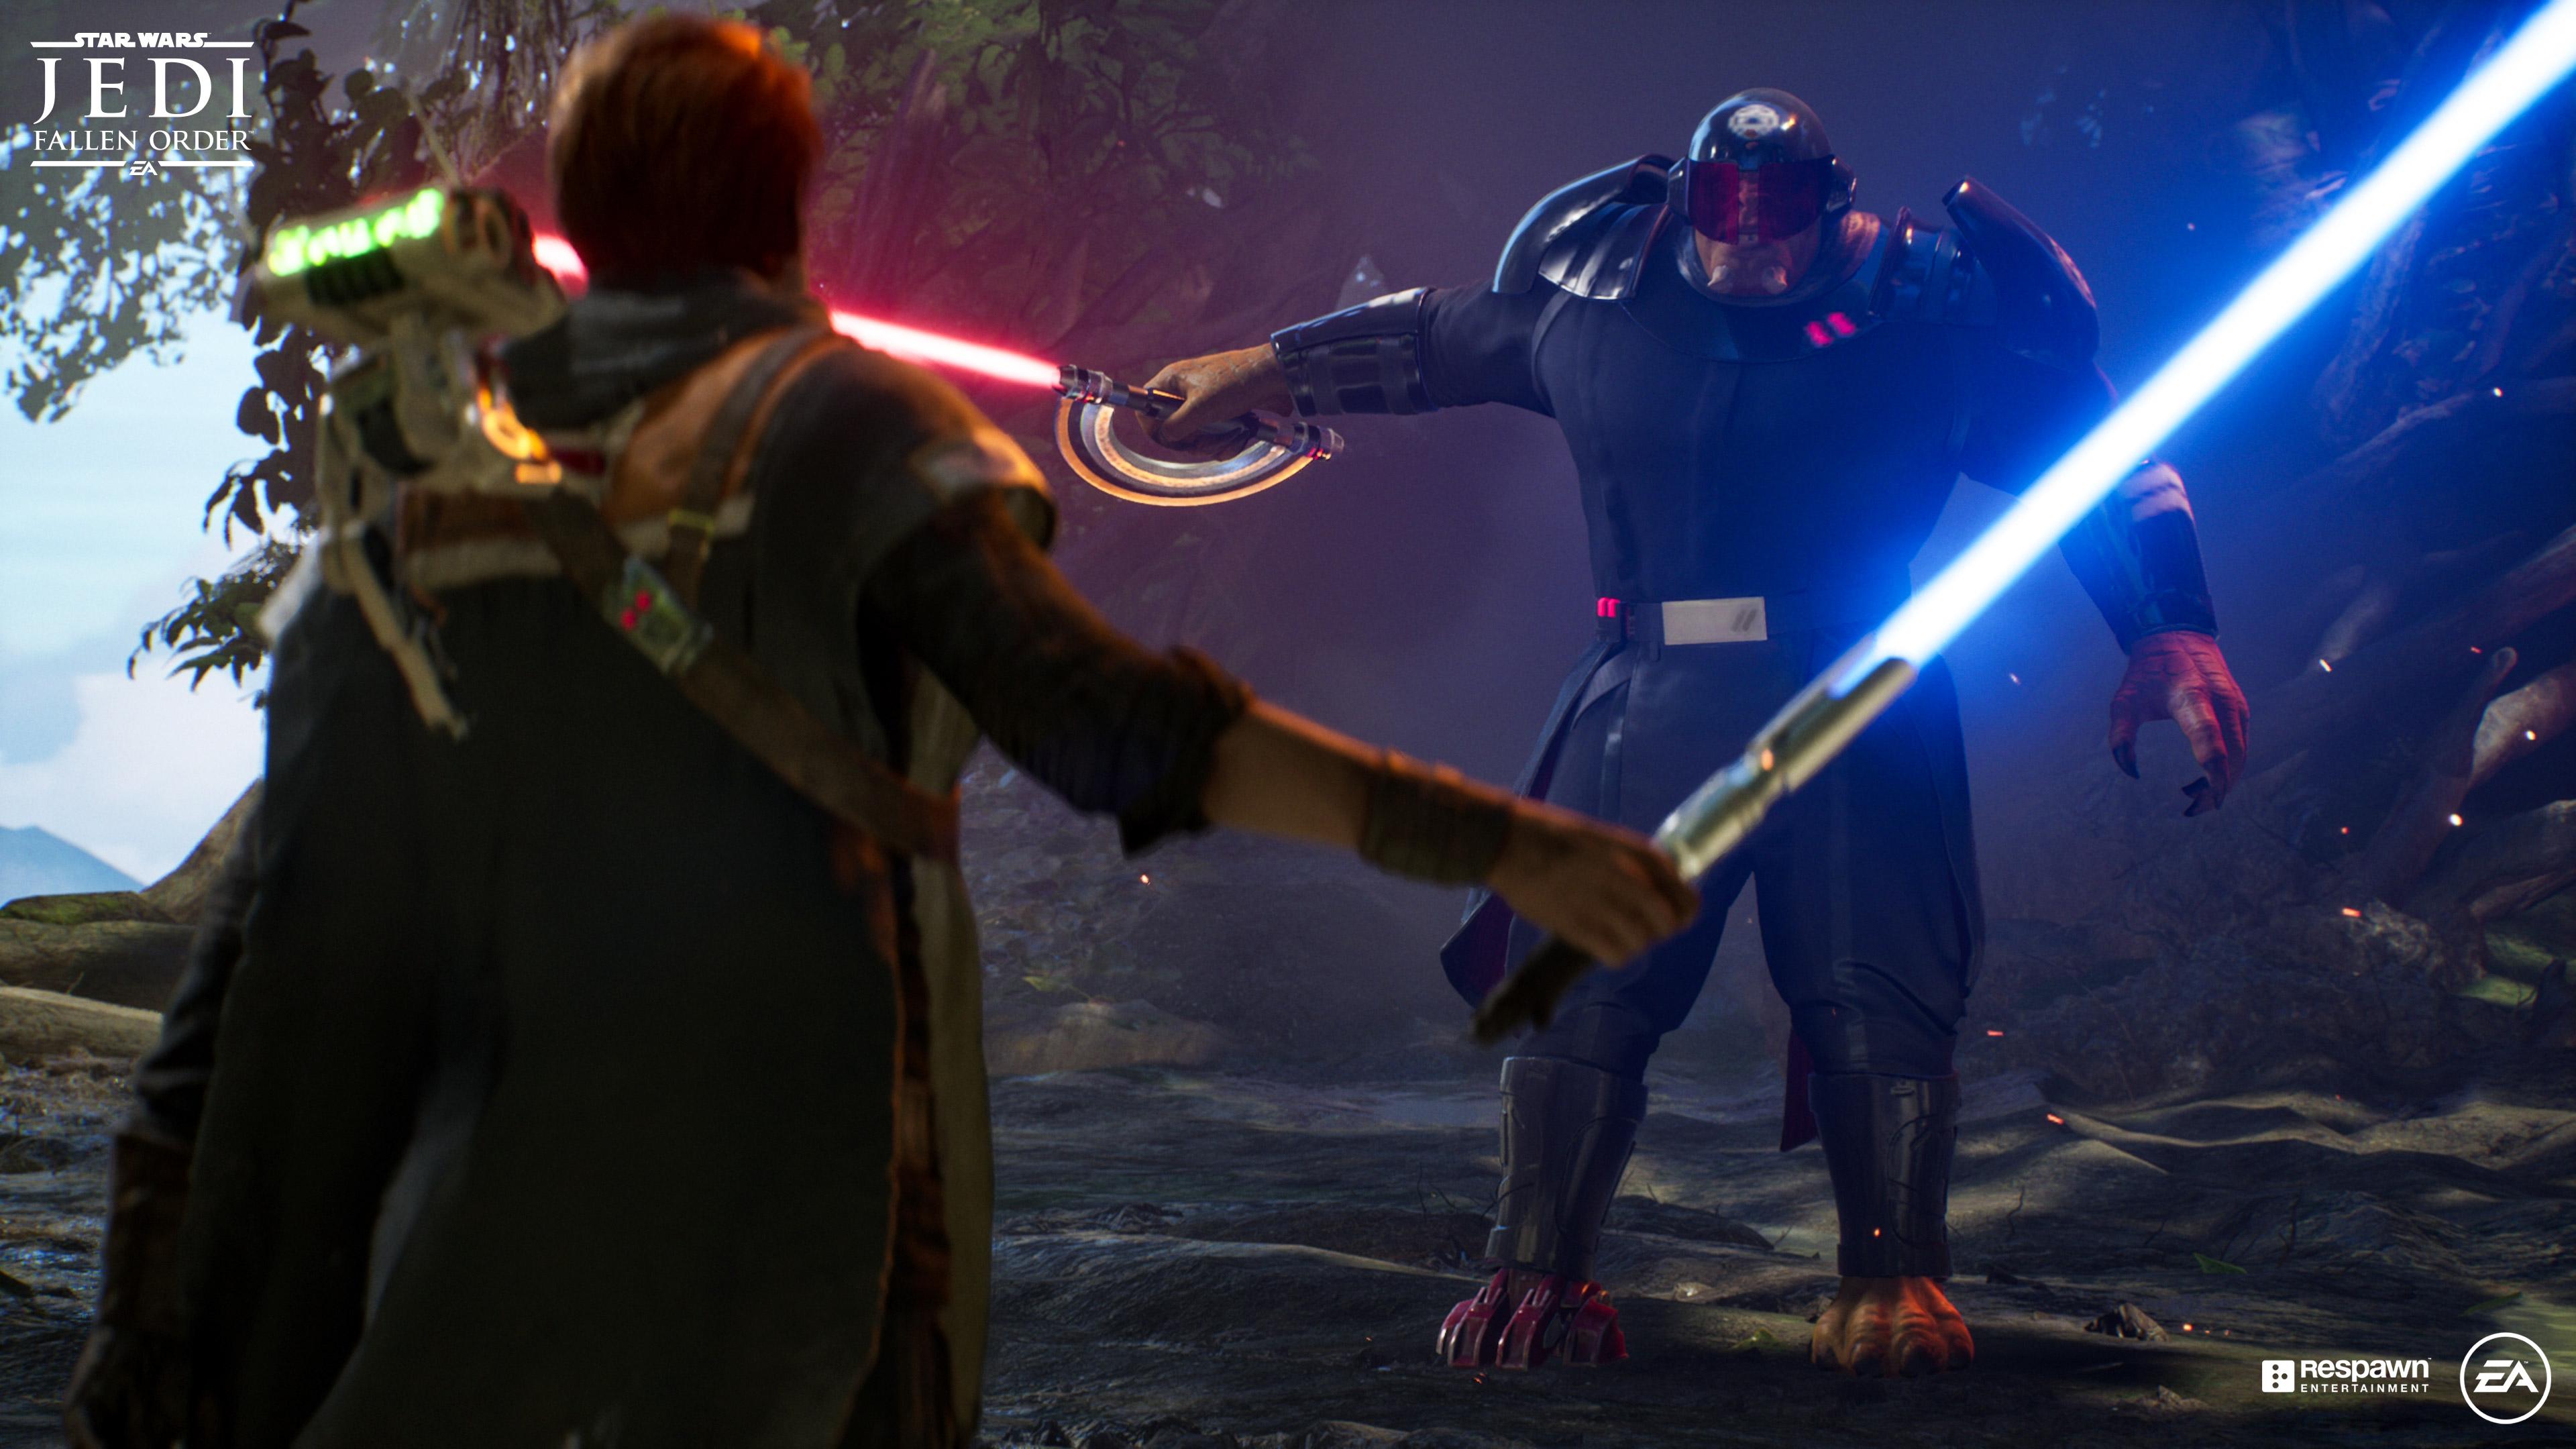 Jedi Fallen Order analysis